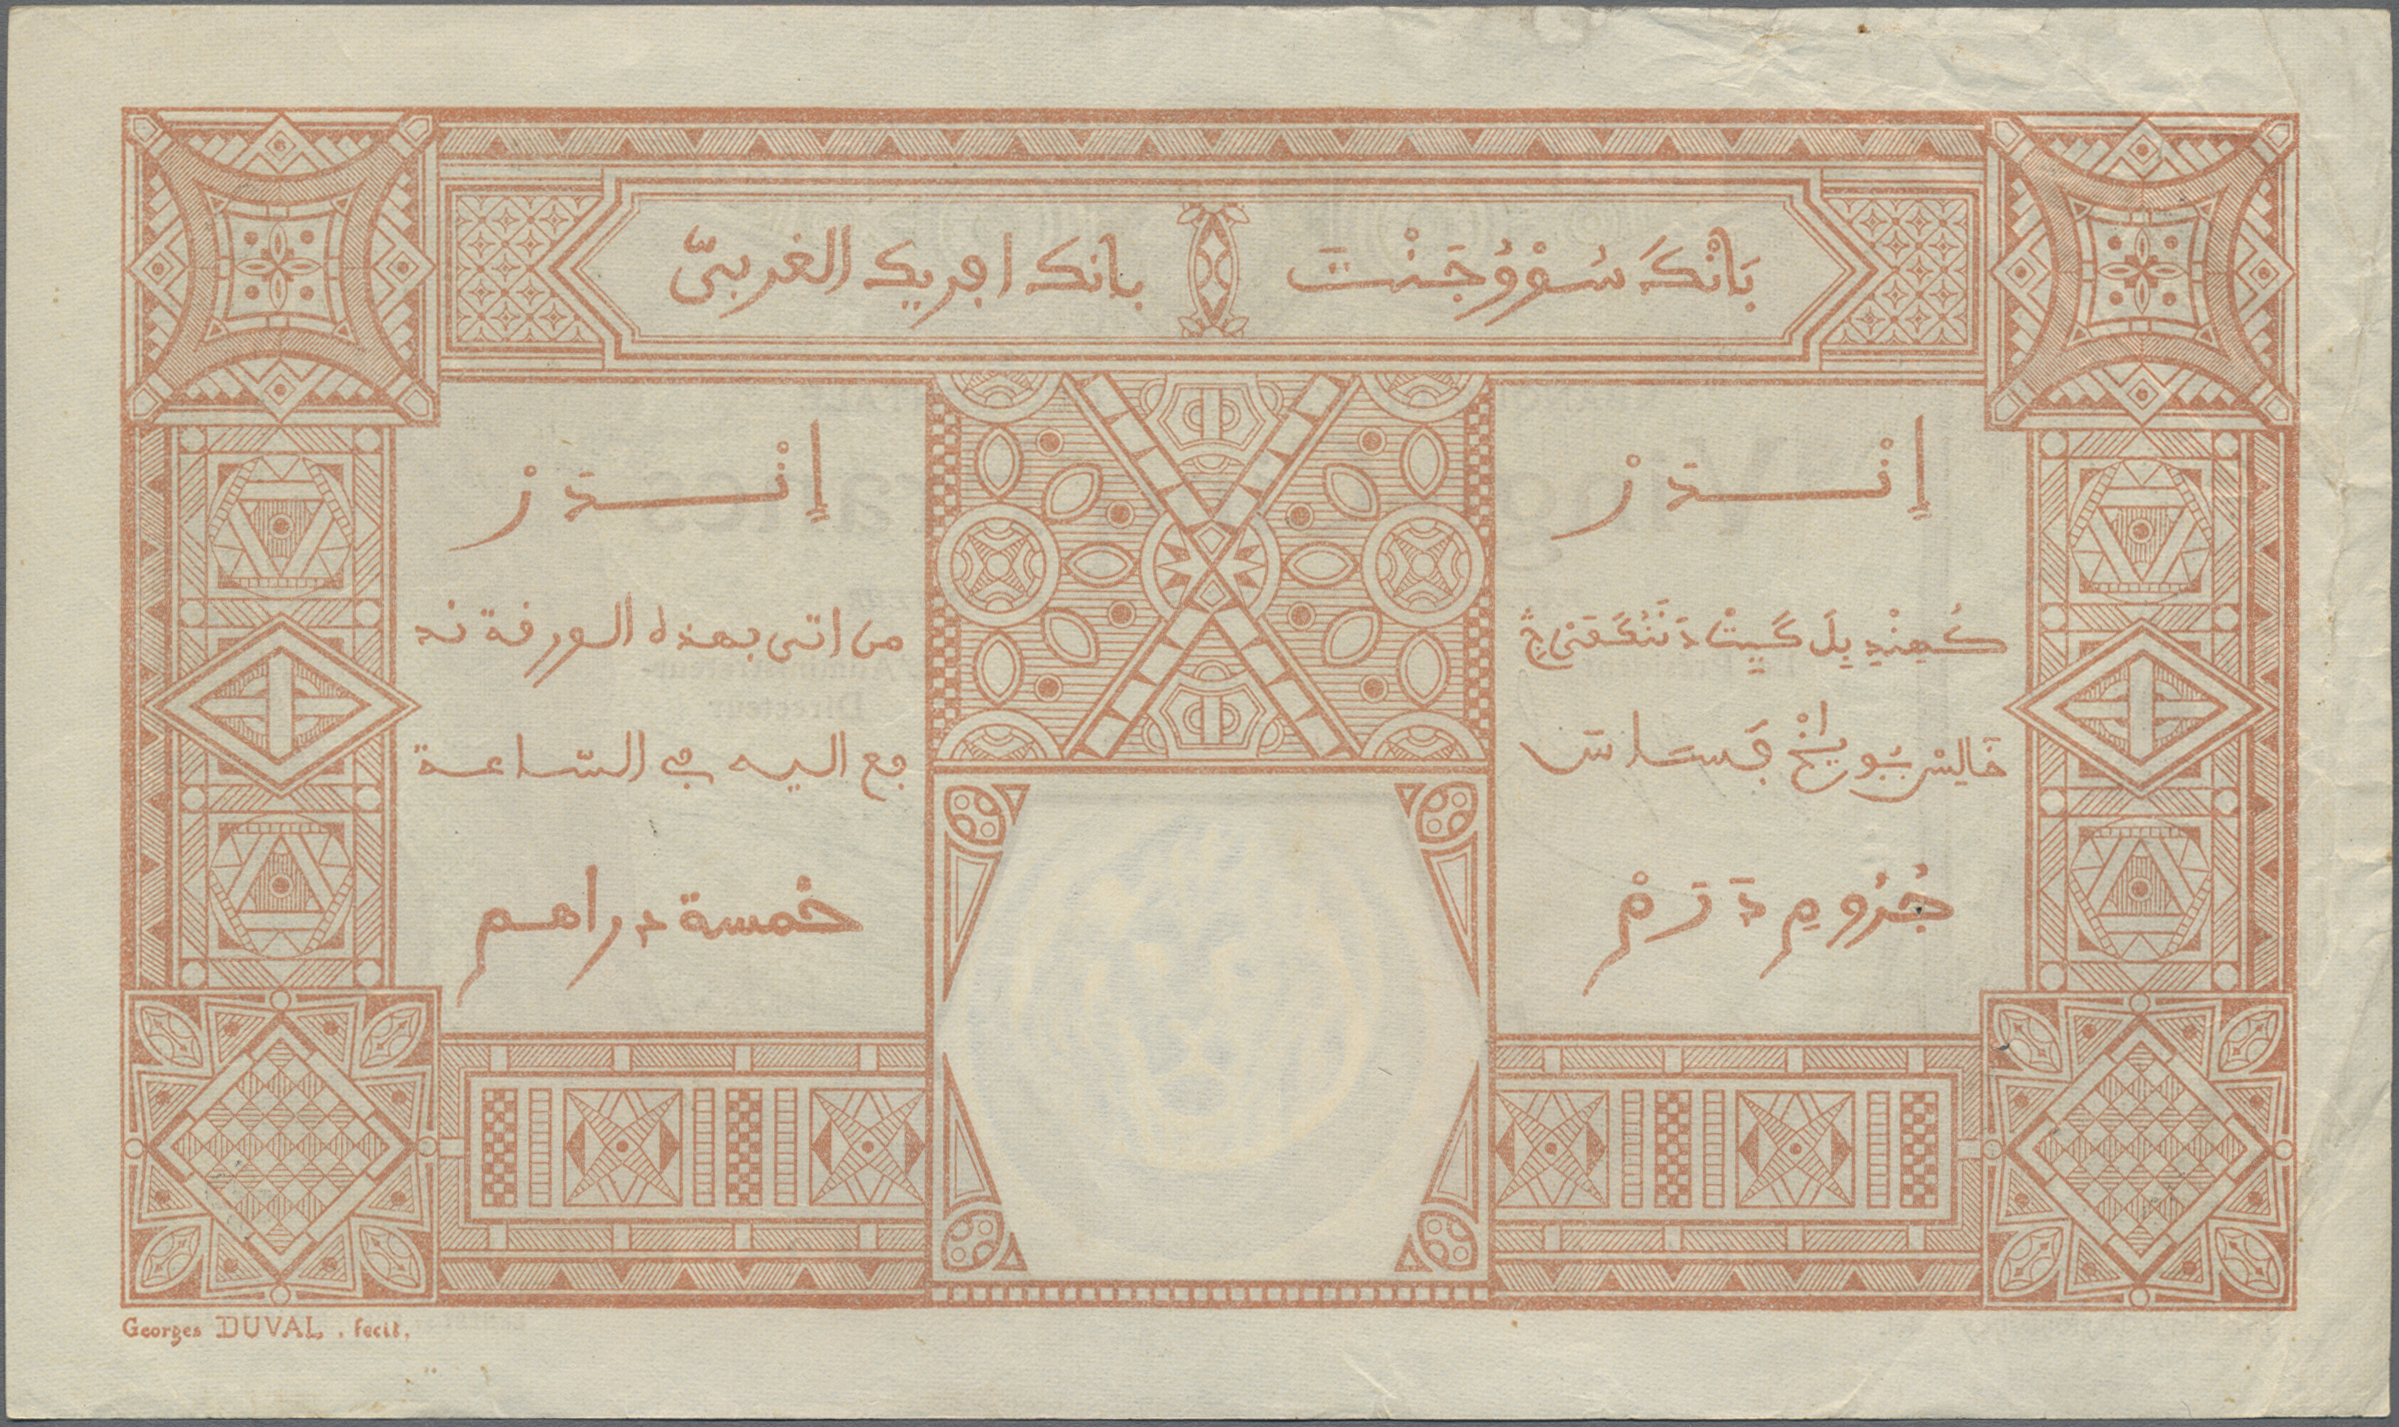 Lot 00350 - French West Africa / Französisch Westafrika   Banknoten  -  Auktionshaus Christoph Gärtner GmbH & Co. KG Sale #48 The Banknotes